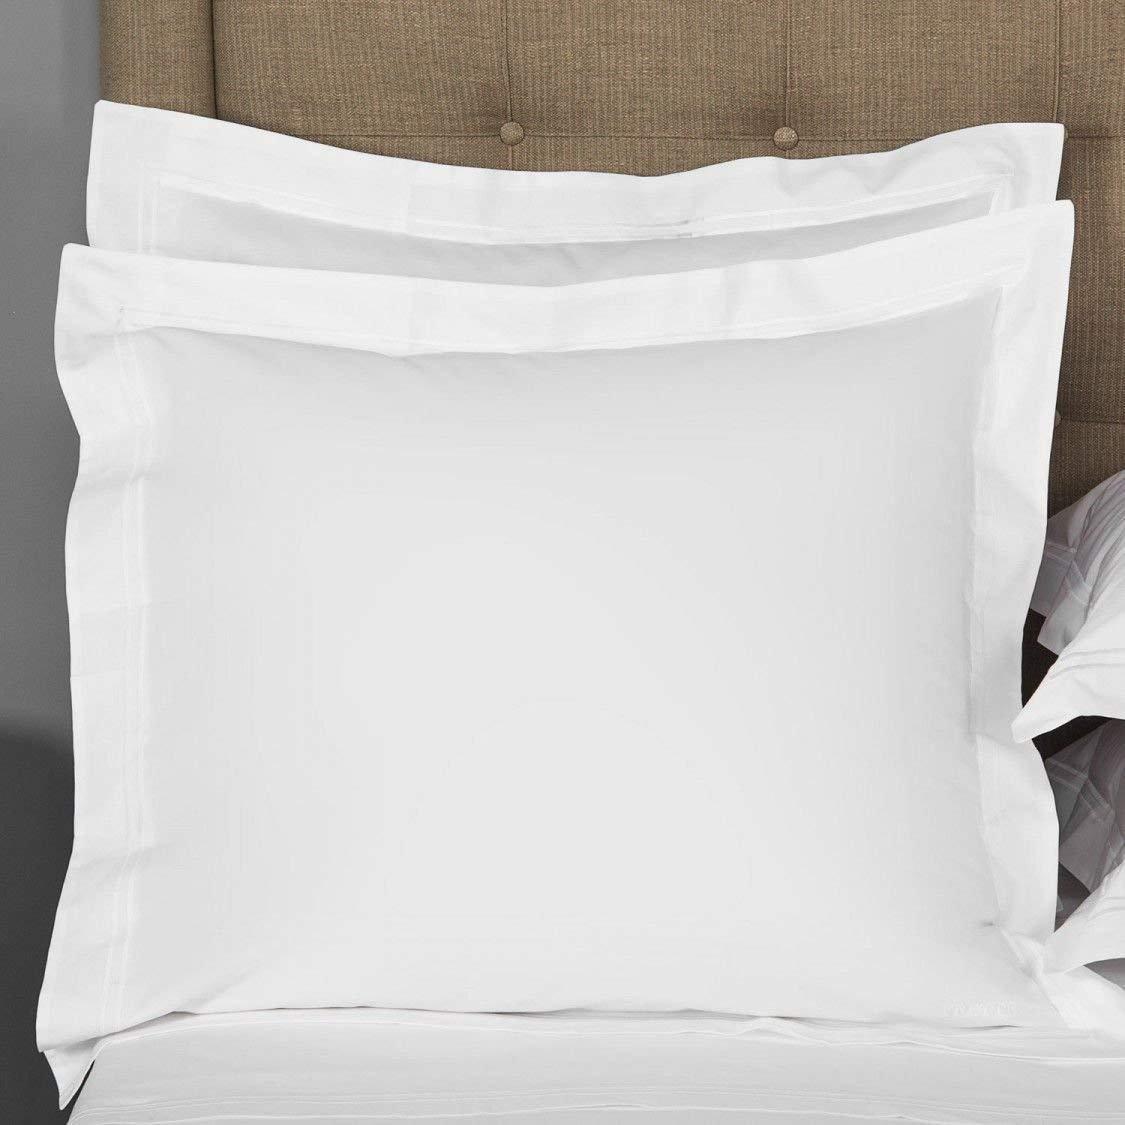 beddingstar Euro Pillow Shams 24x24 White Solid European Square Pillows Shams Set Of 2 Pc Pillowcase Euro 24x24 Pillow Cover 550 Thread Count With 100% Egyptian Cotton 2 Pack, Euro 24 x 24